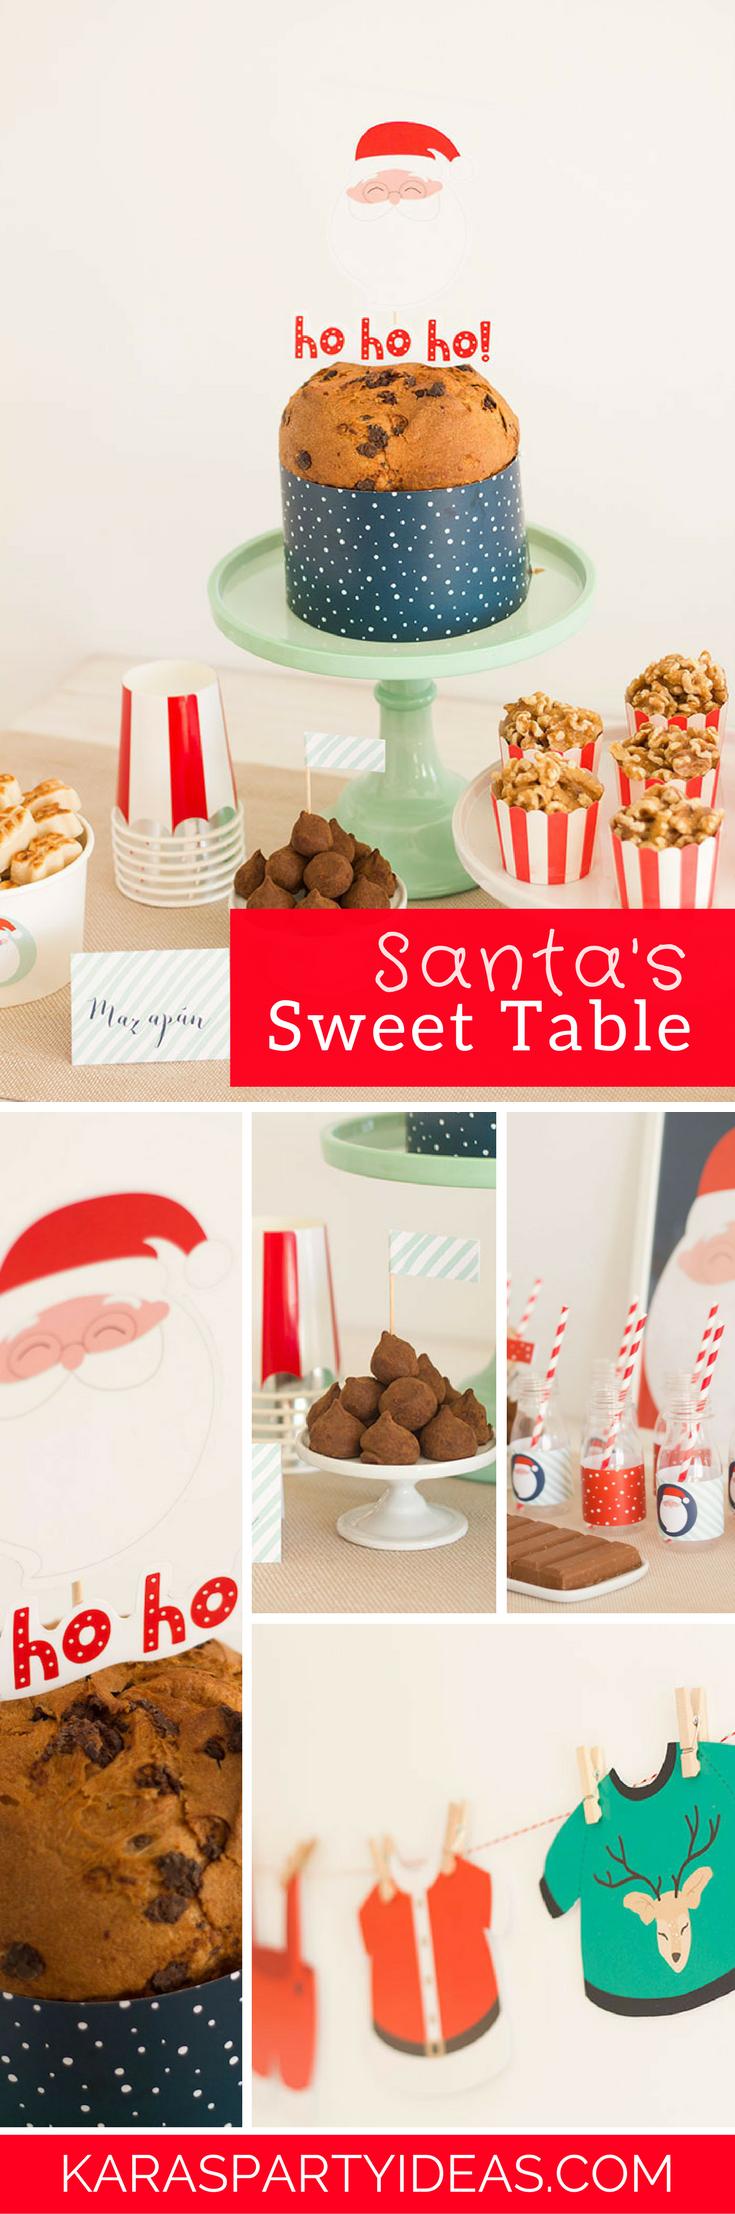 Santa's Sweet Table via Kara's Party Ideas - KarasPartyIdeas.com